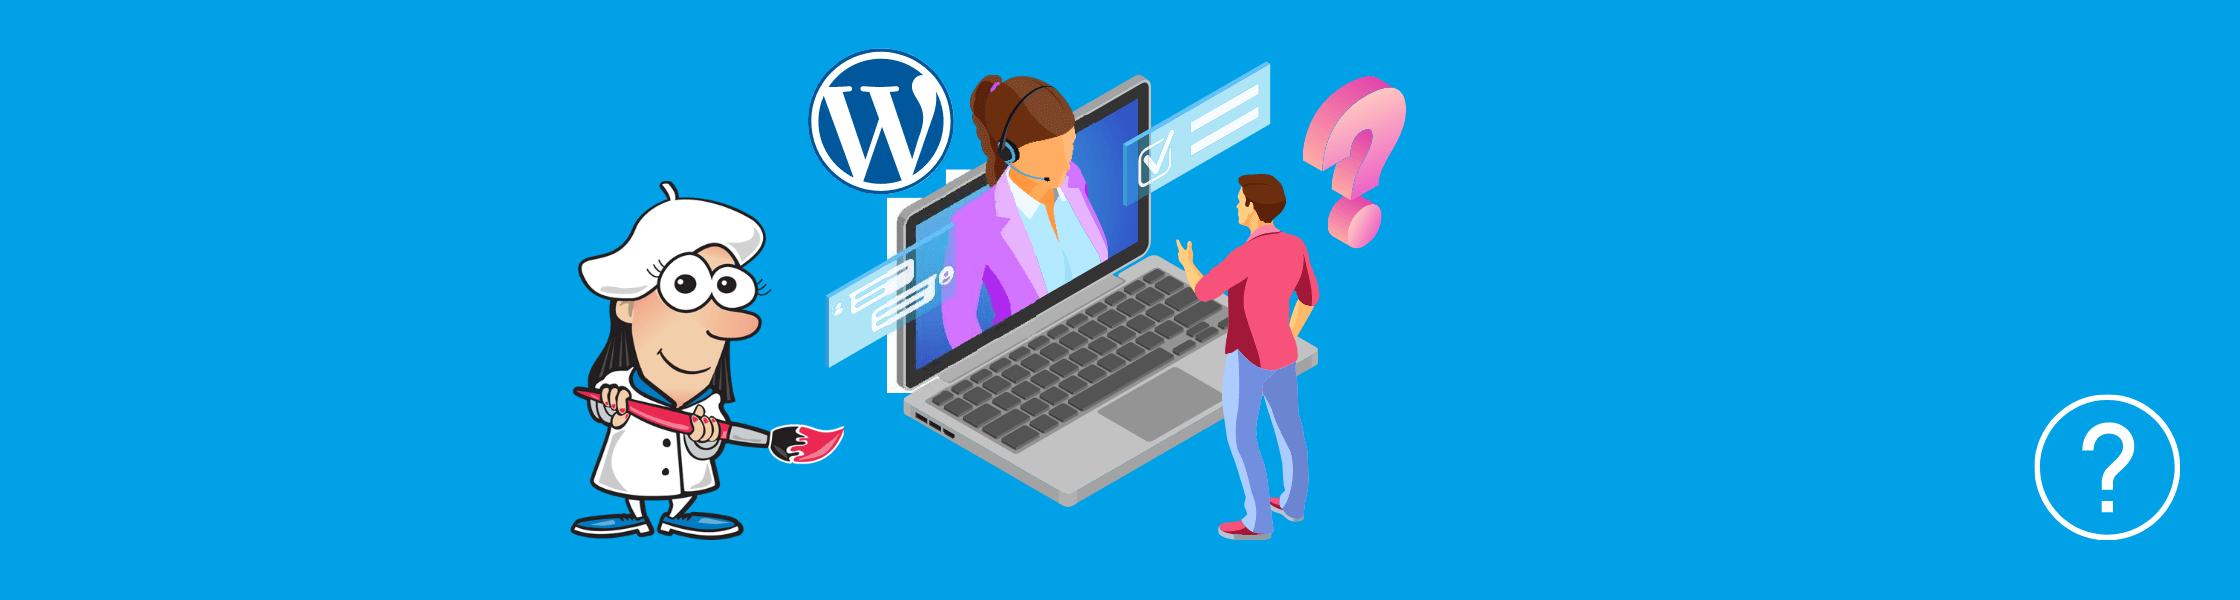 WordPress Website Maintenance and Support - Bizstyler